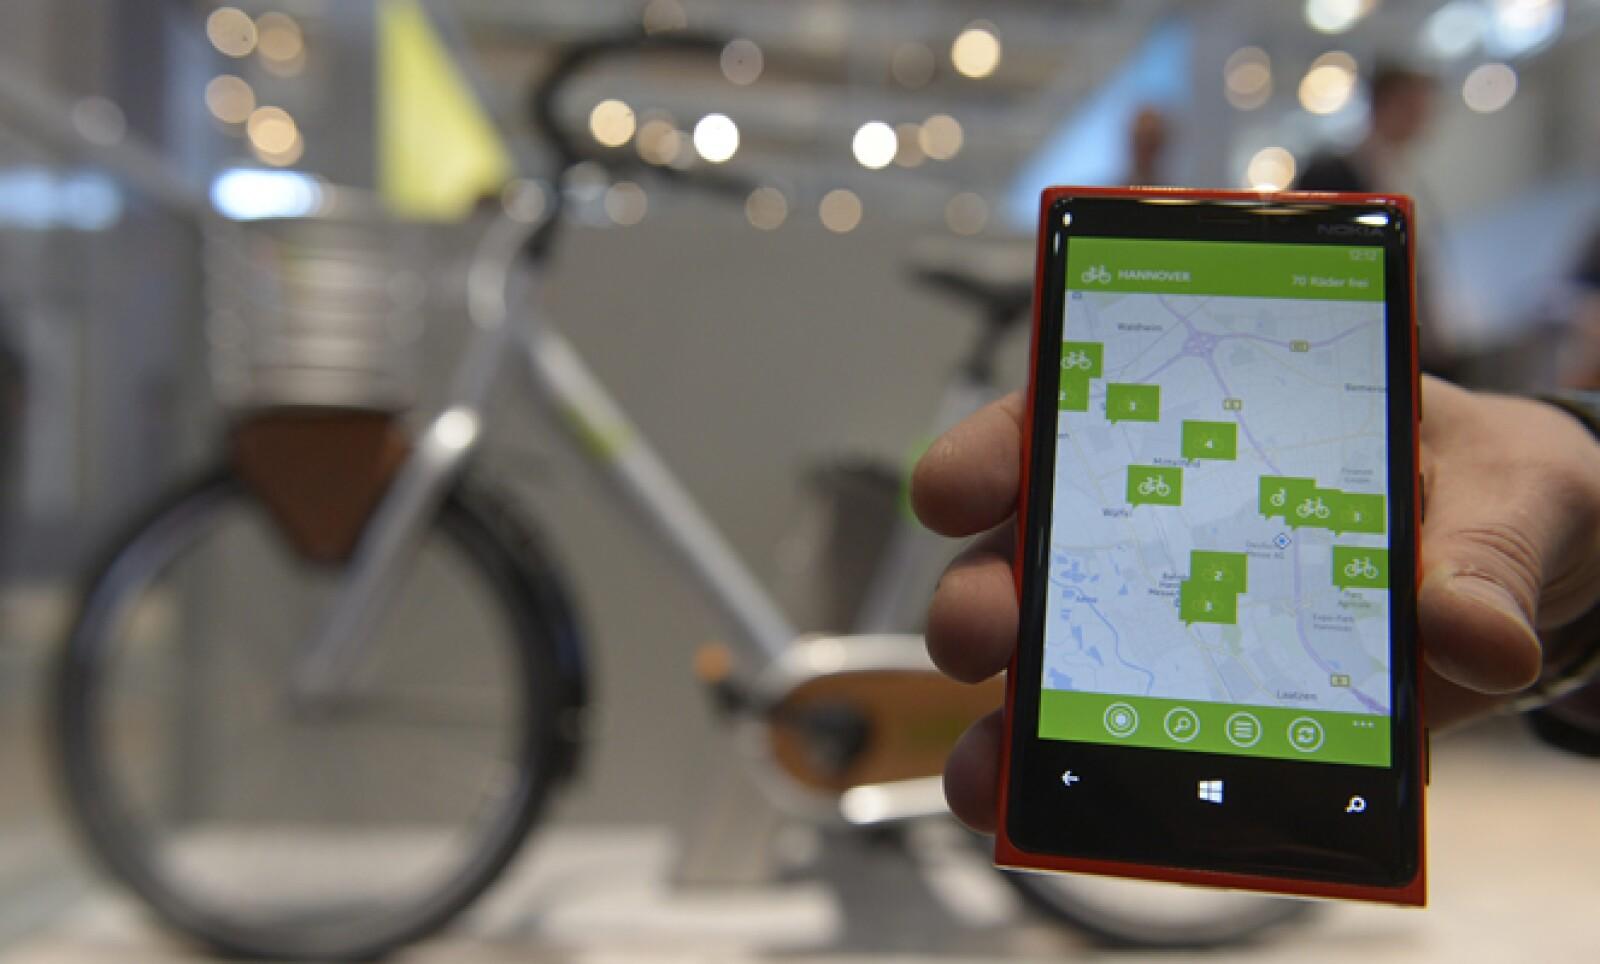 Un empleado posa con un teléfono inteligente para demostrar un sistema de intercambio de bicicletas llamado Contoso Bikes.